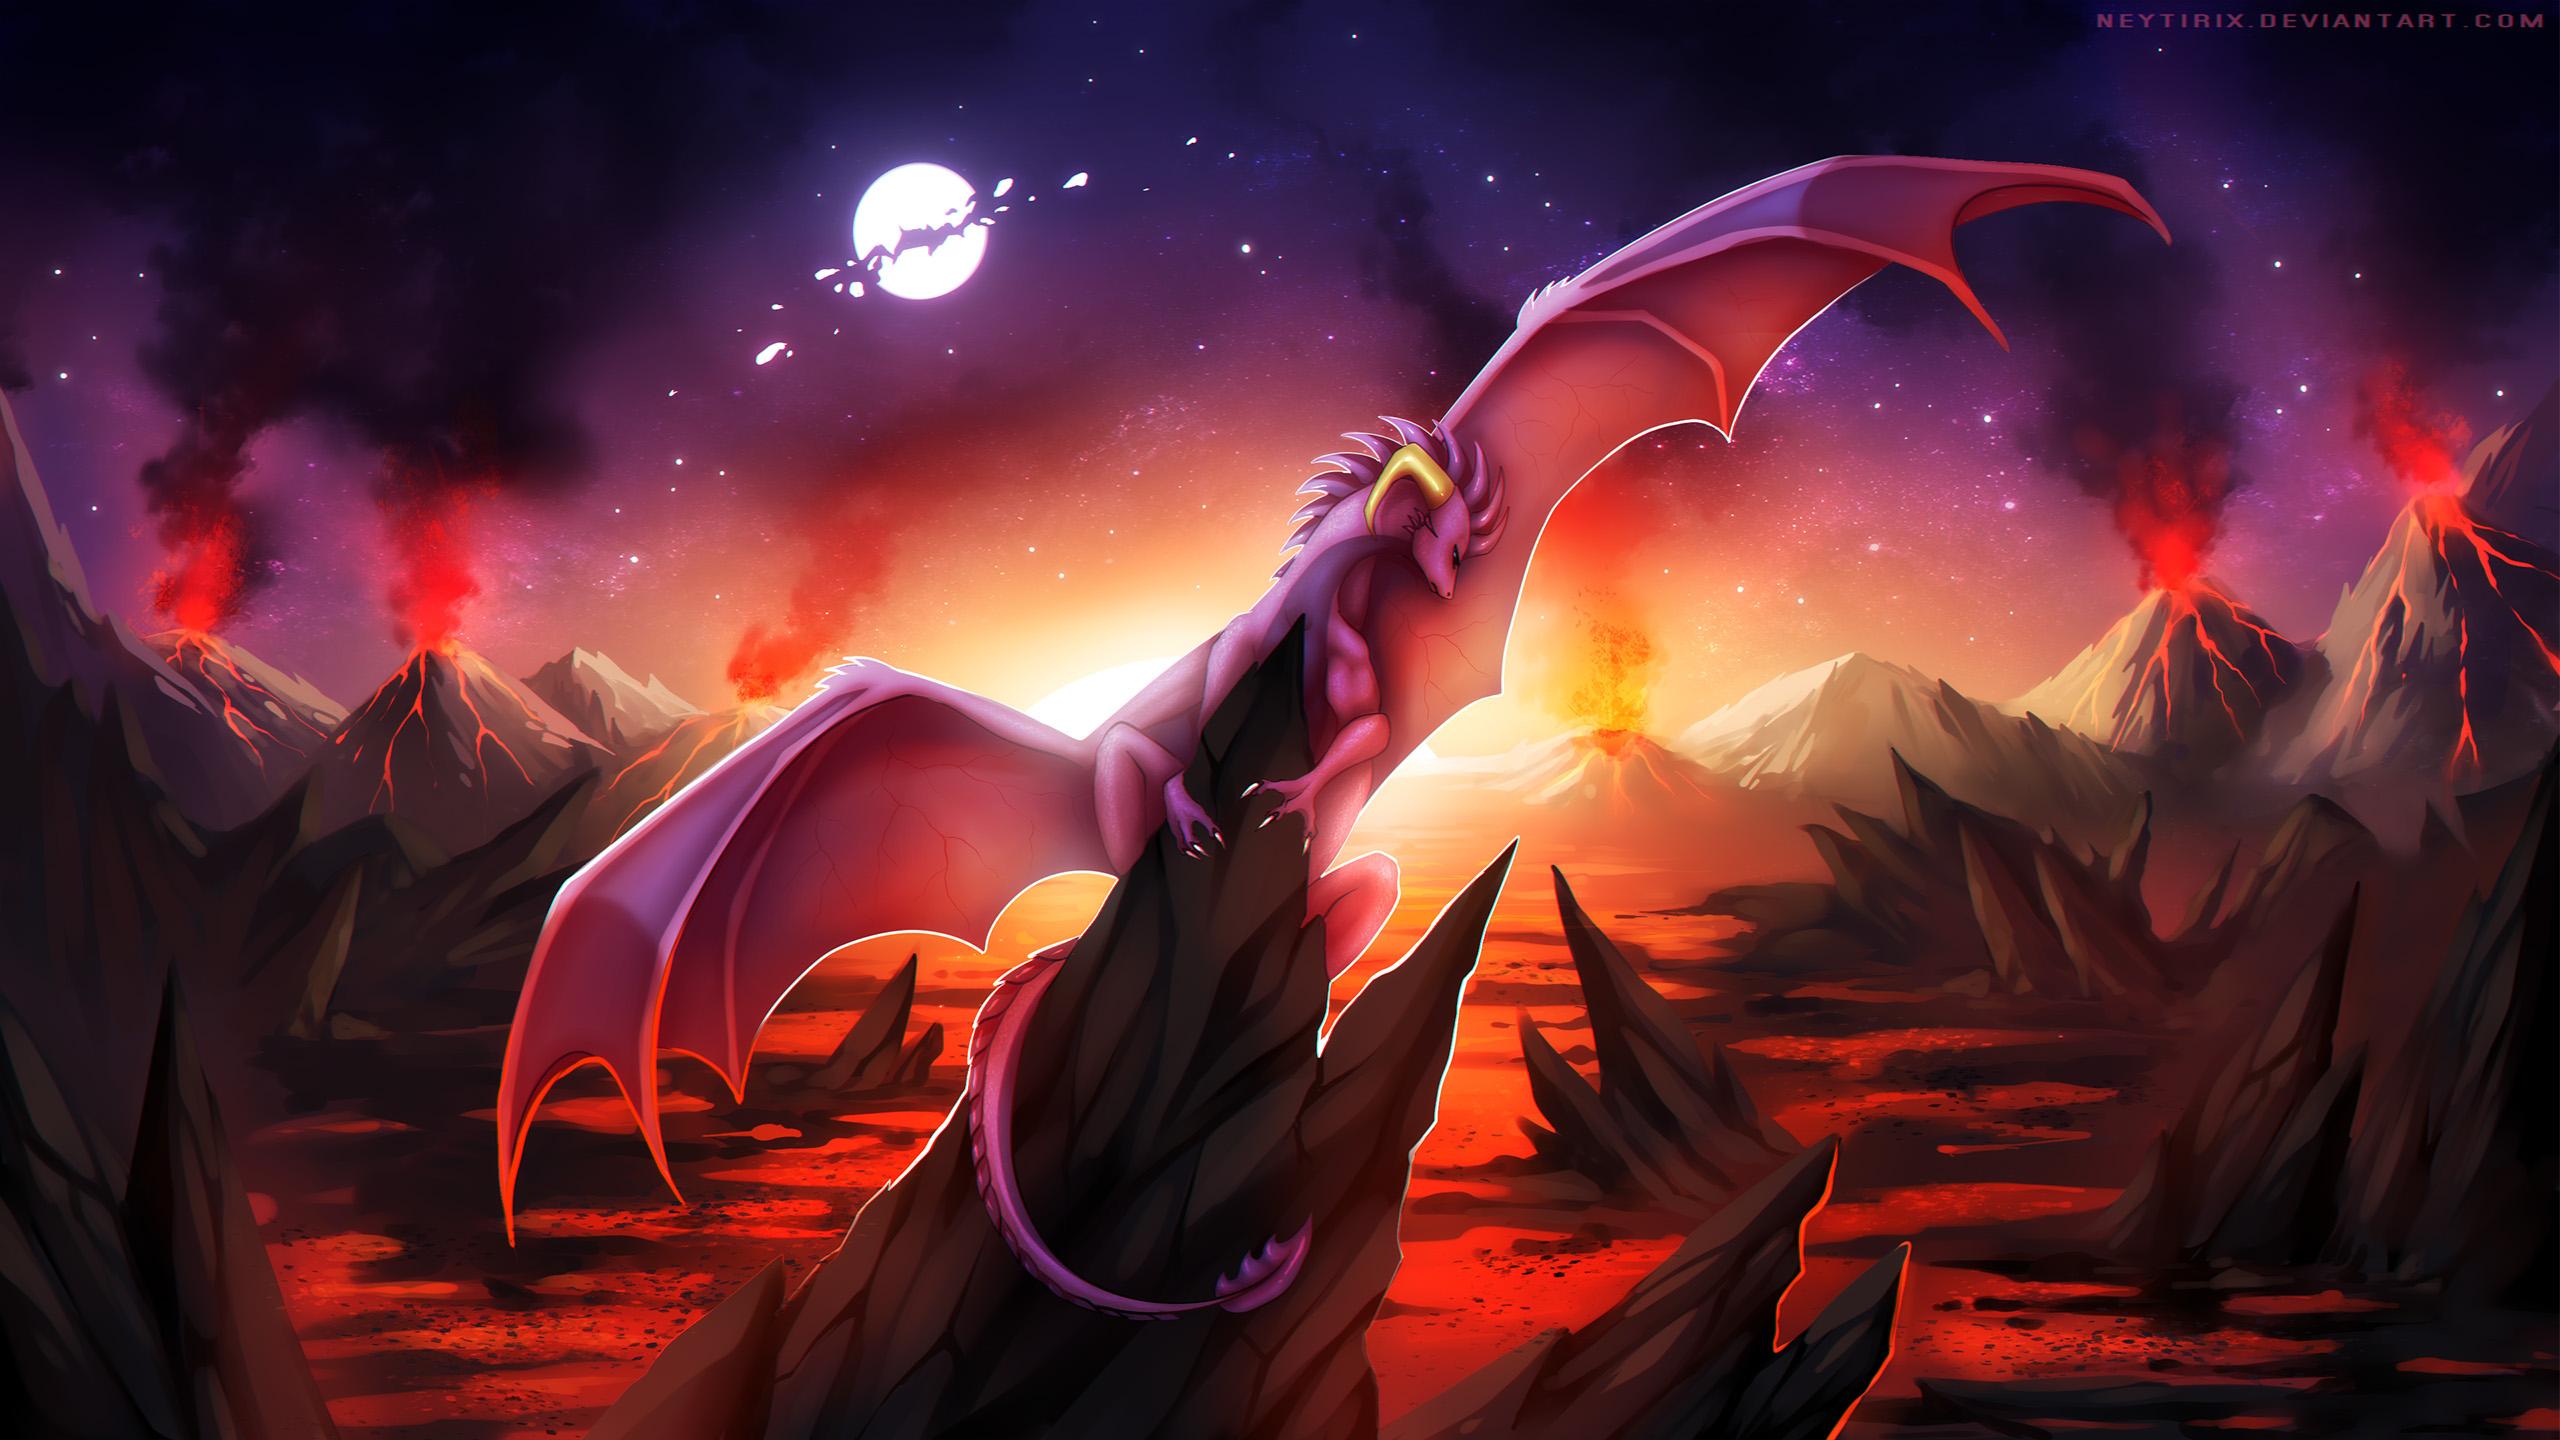 Sexual fantasy kingdom some of vol 1 - 2 part 4